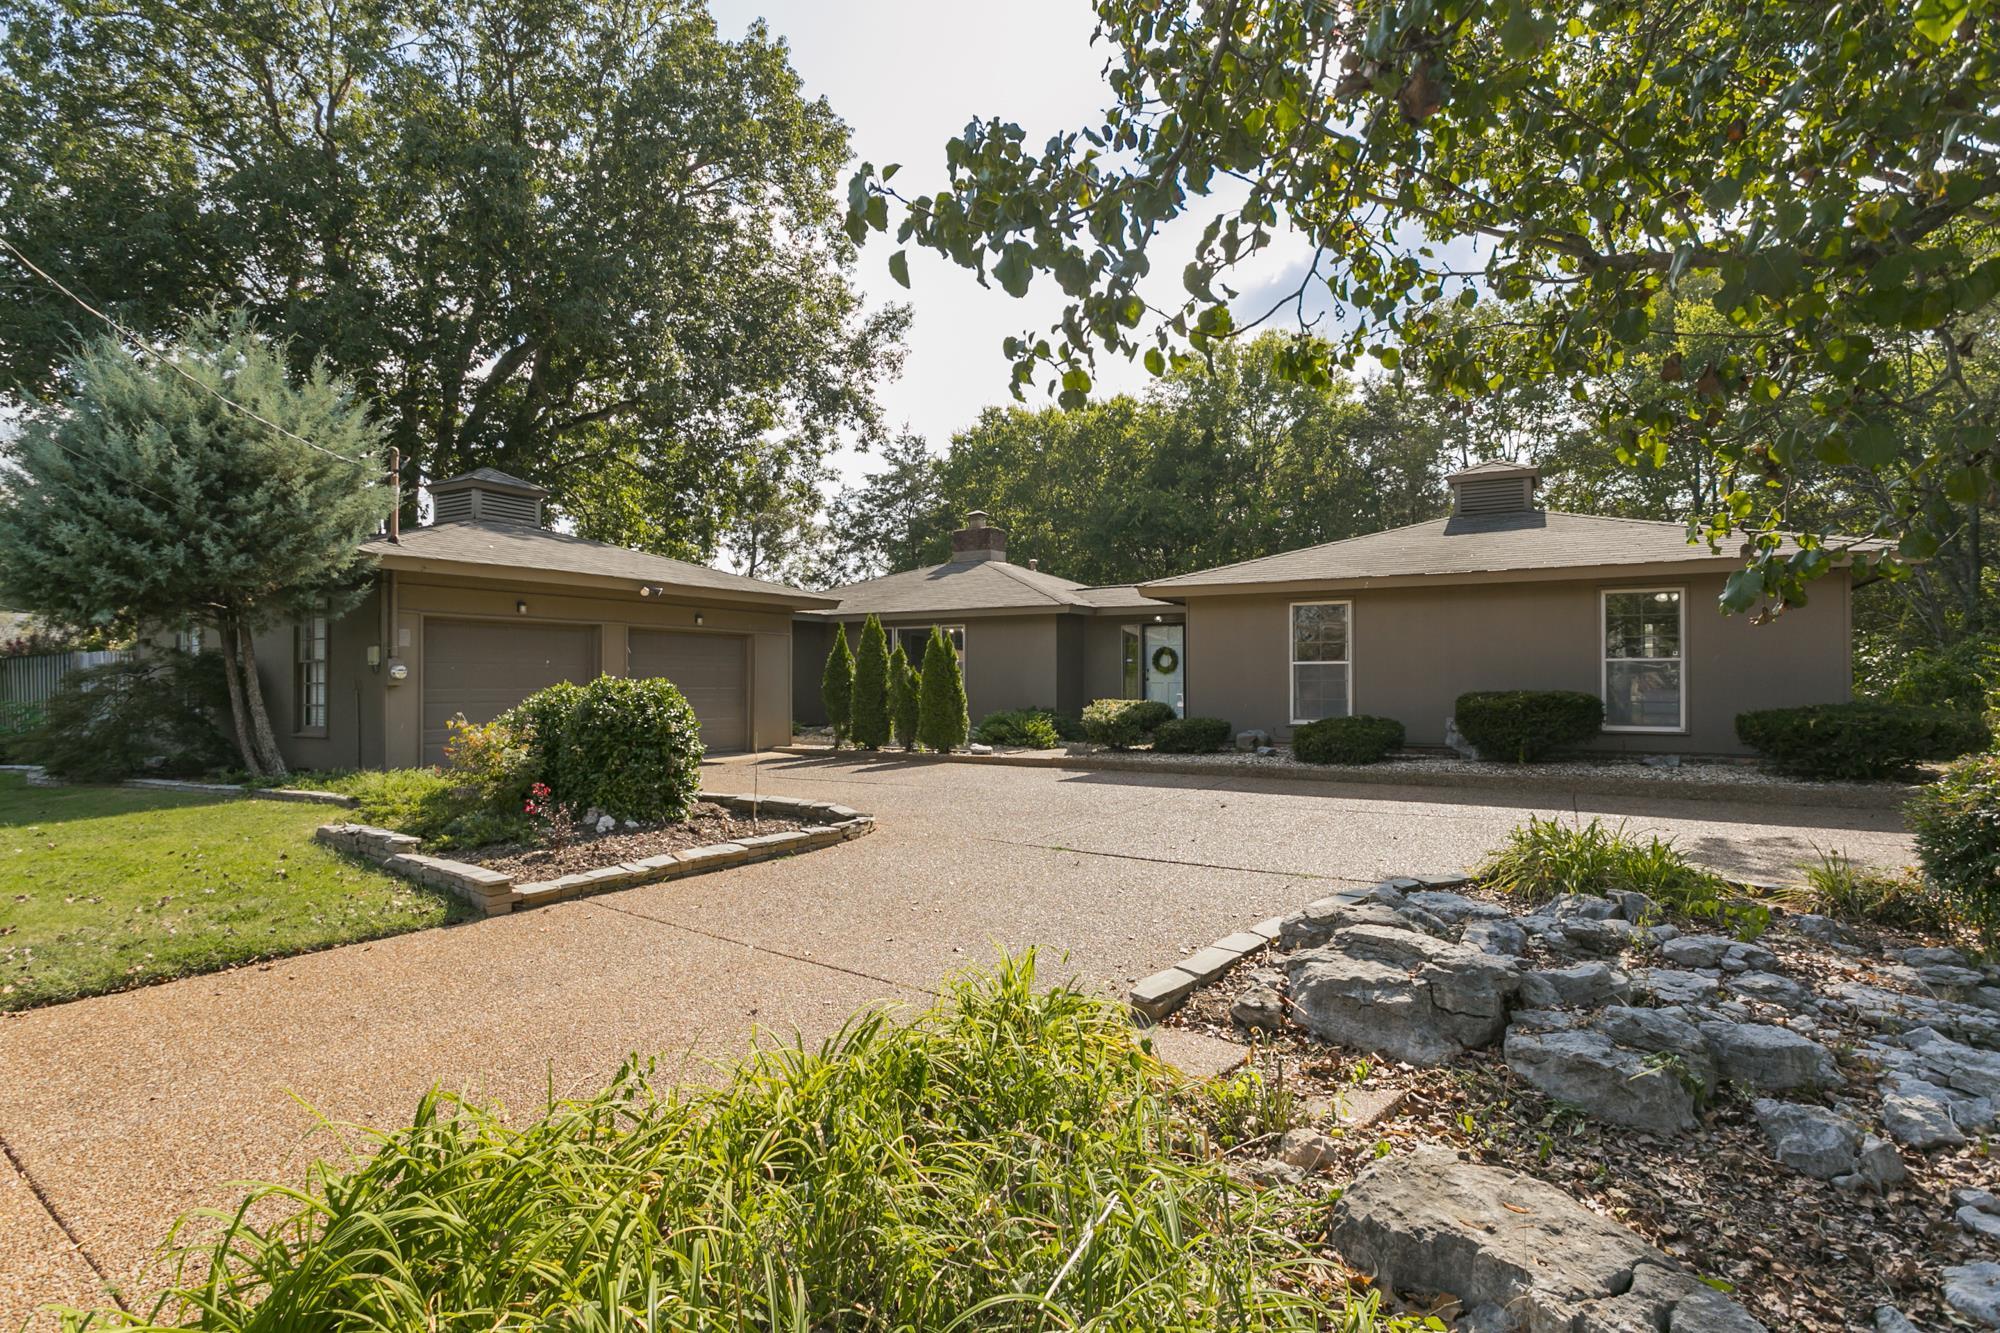 109 Lakeside Ct, Nashville, TN 37217 - Nashville, TN real estate listing